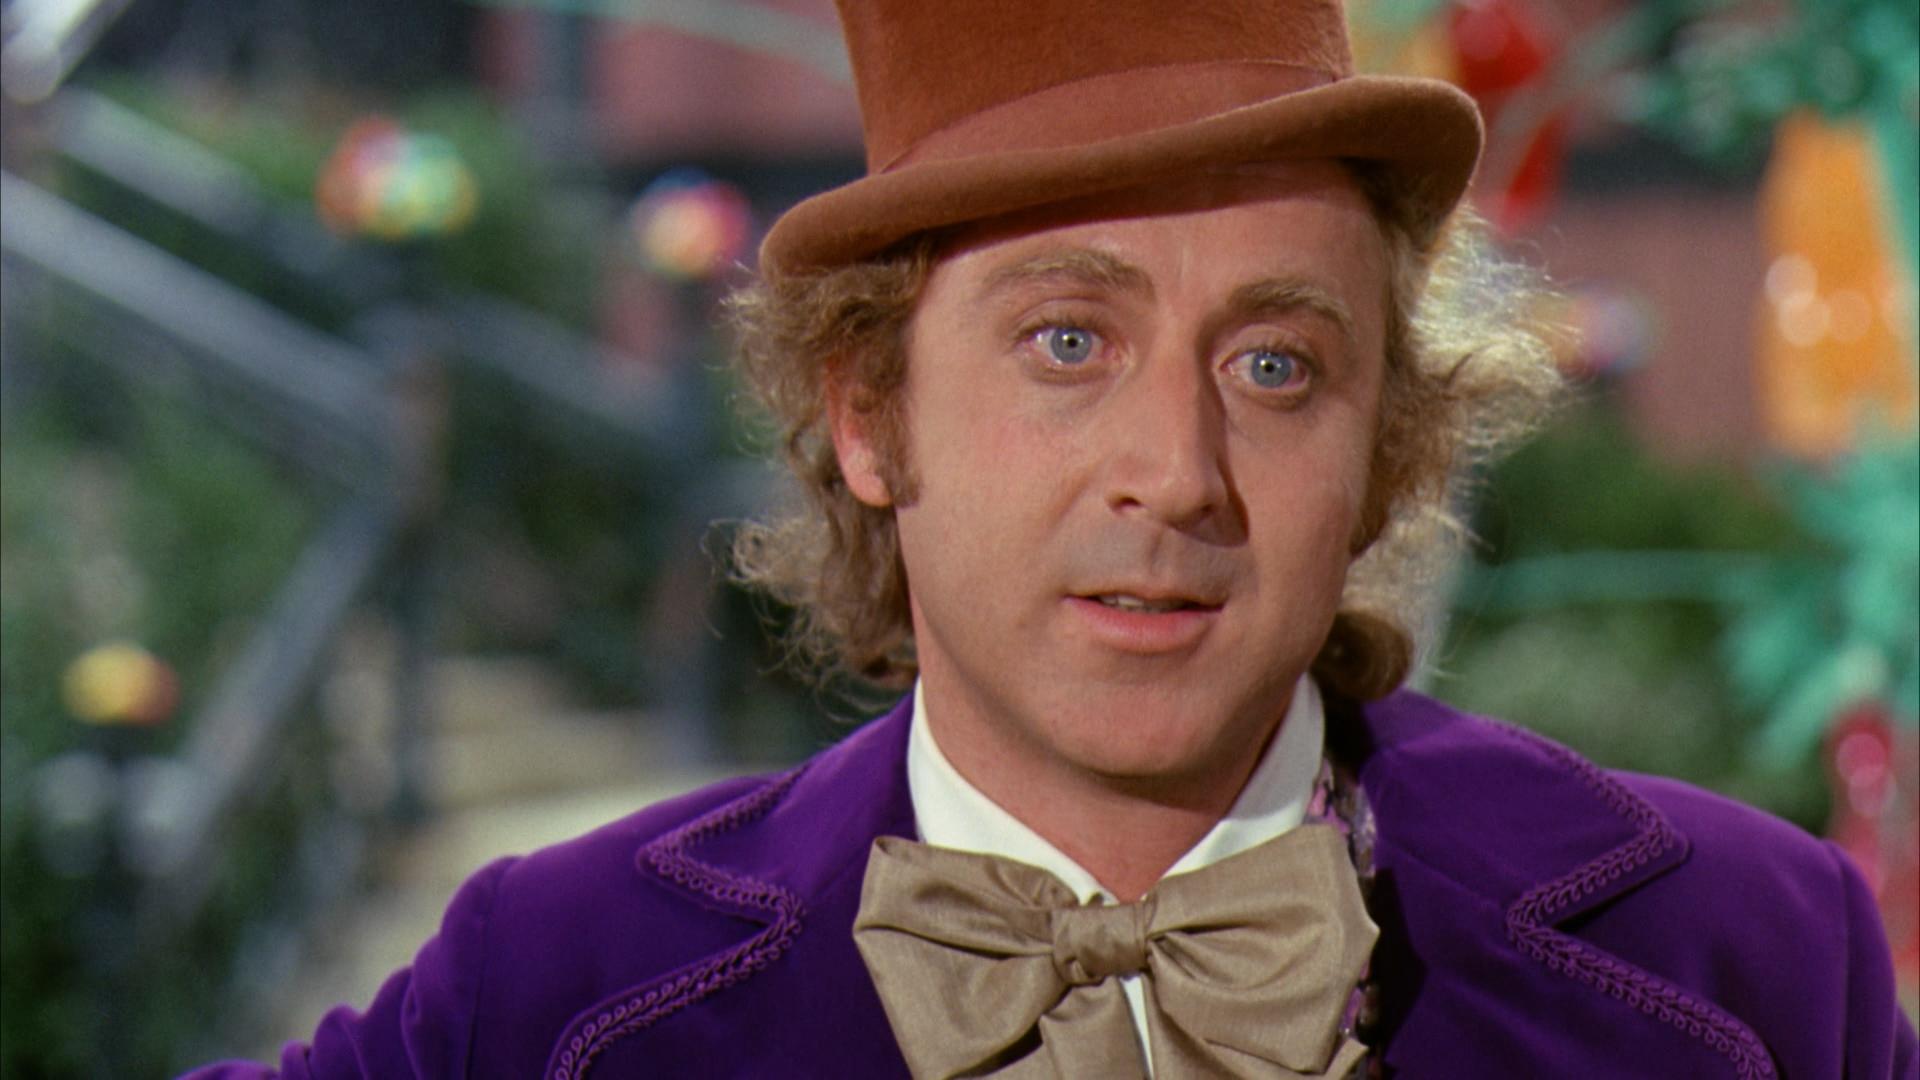 Warner Bros. Developing a New Willy Wonka Movie